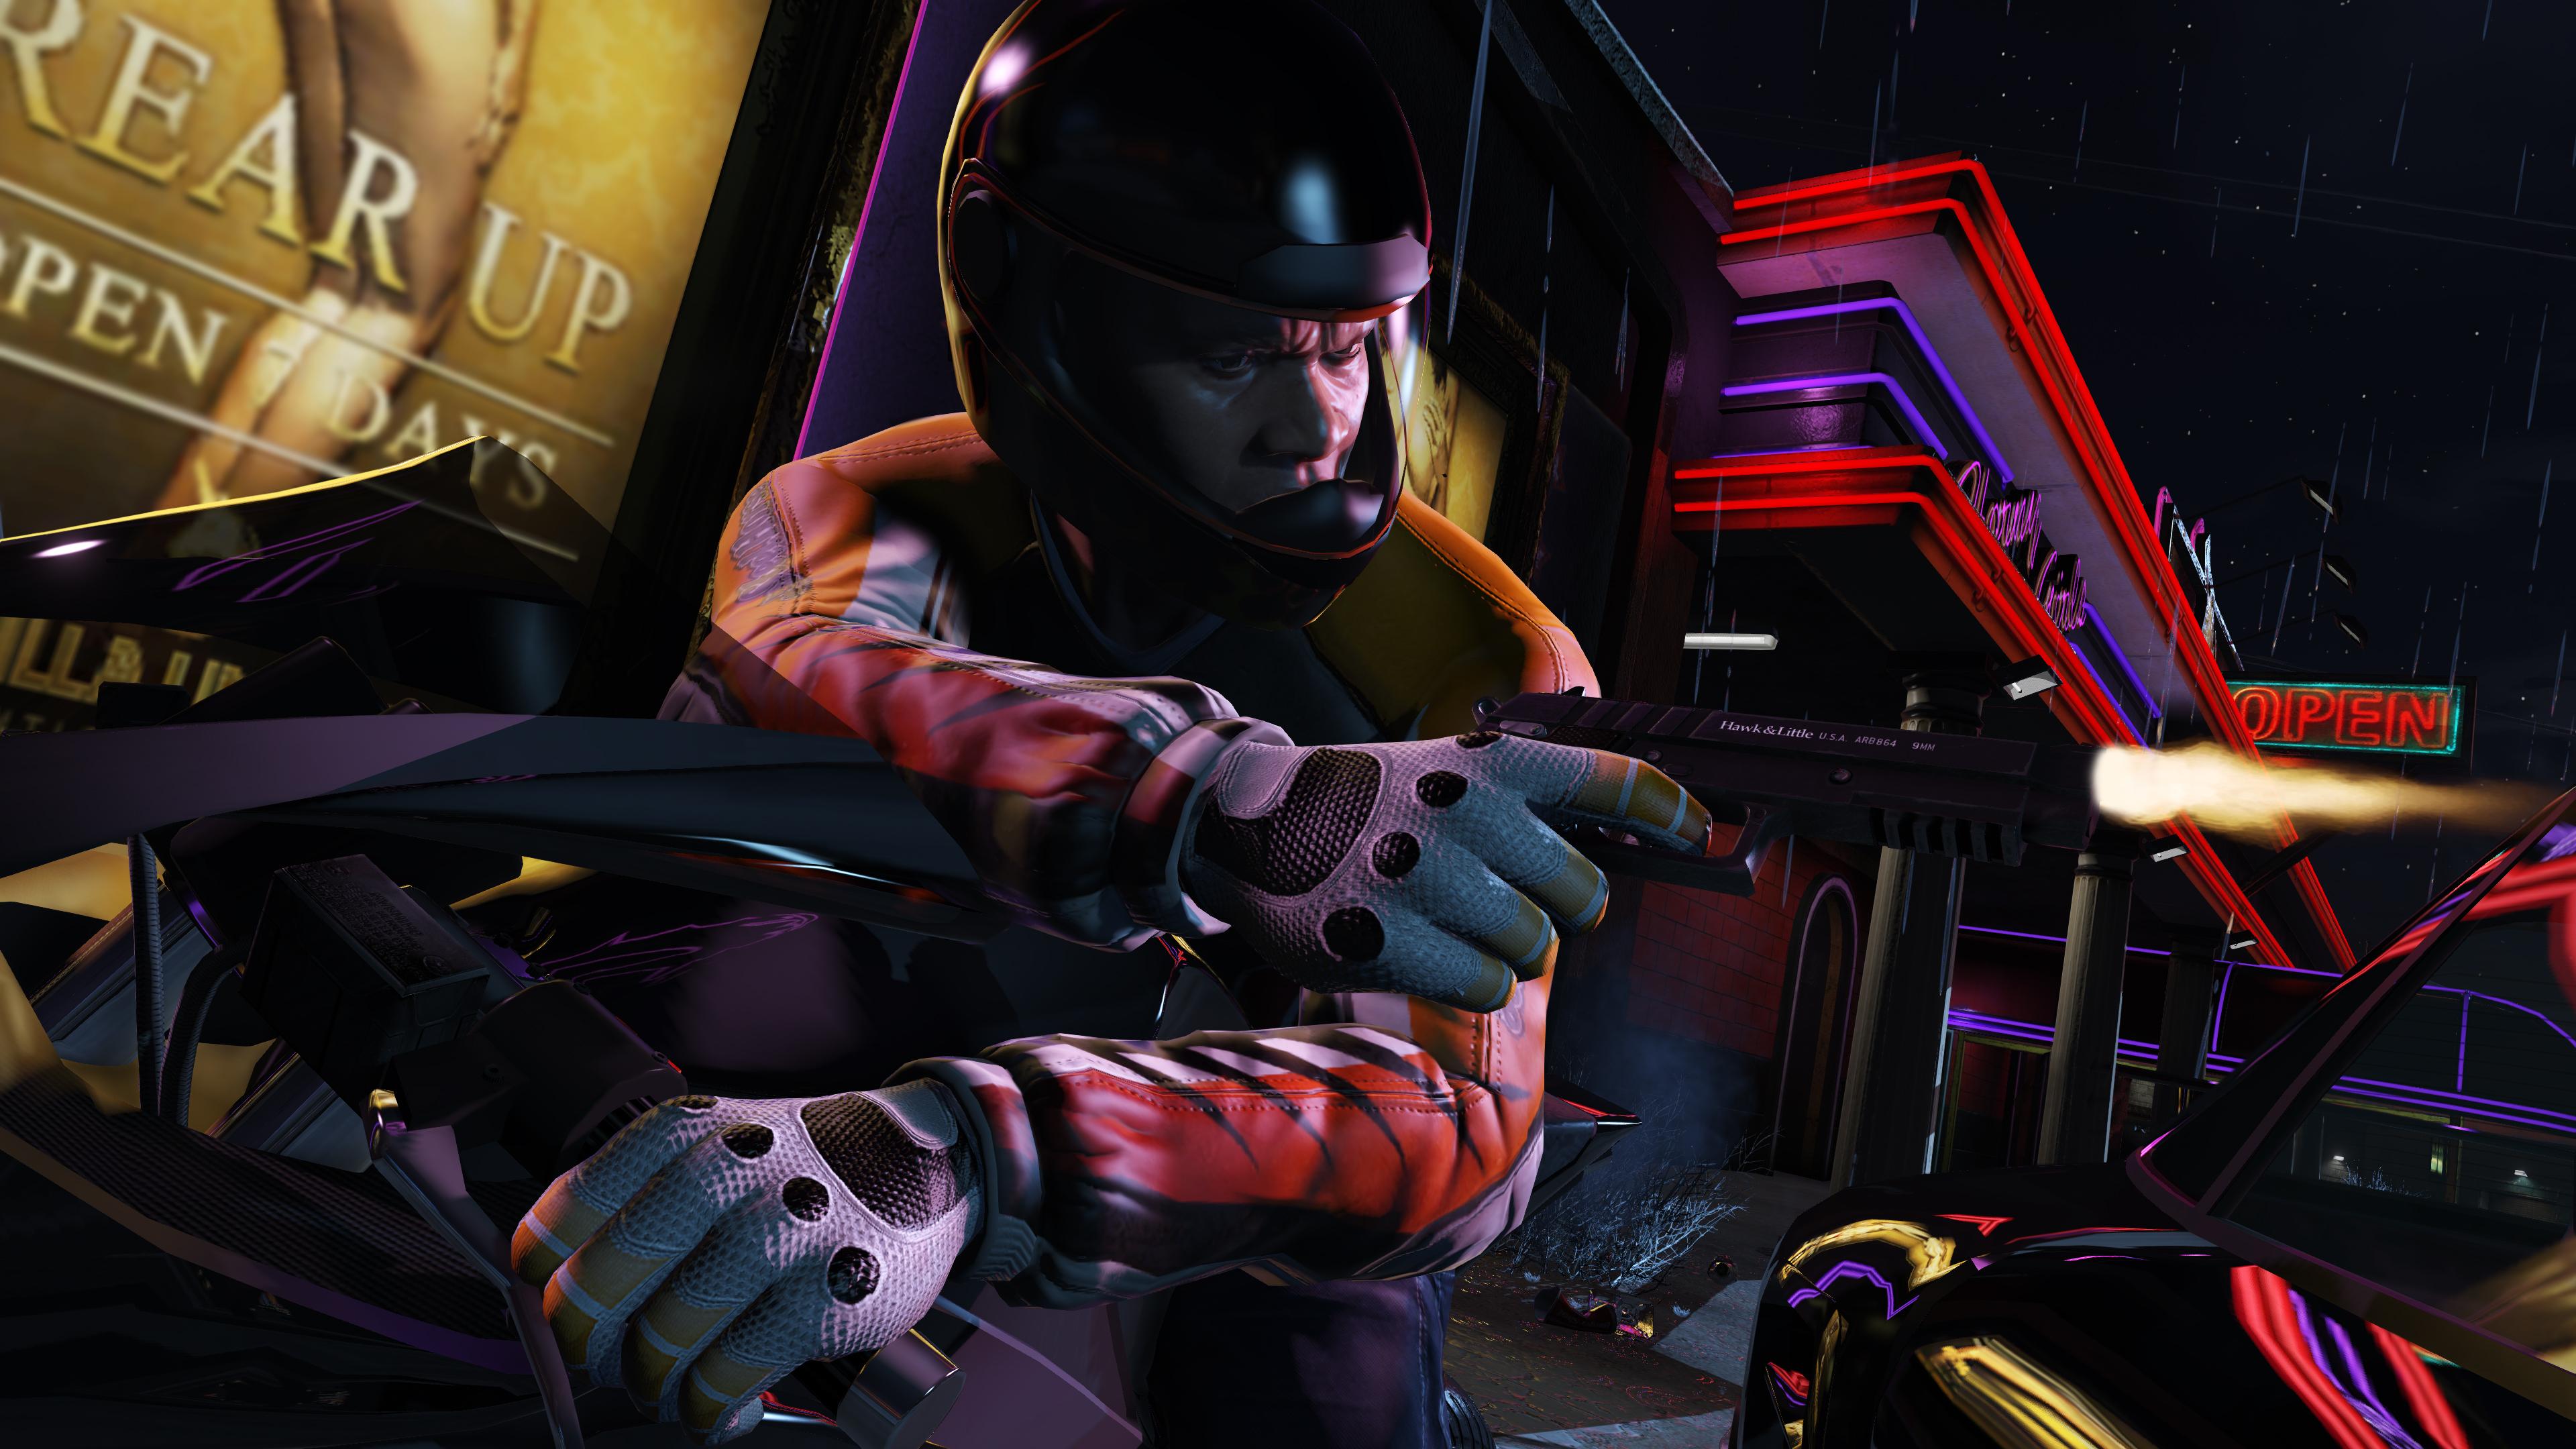 New Grand Theft Auto 5 PC screenshots don't make that delay